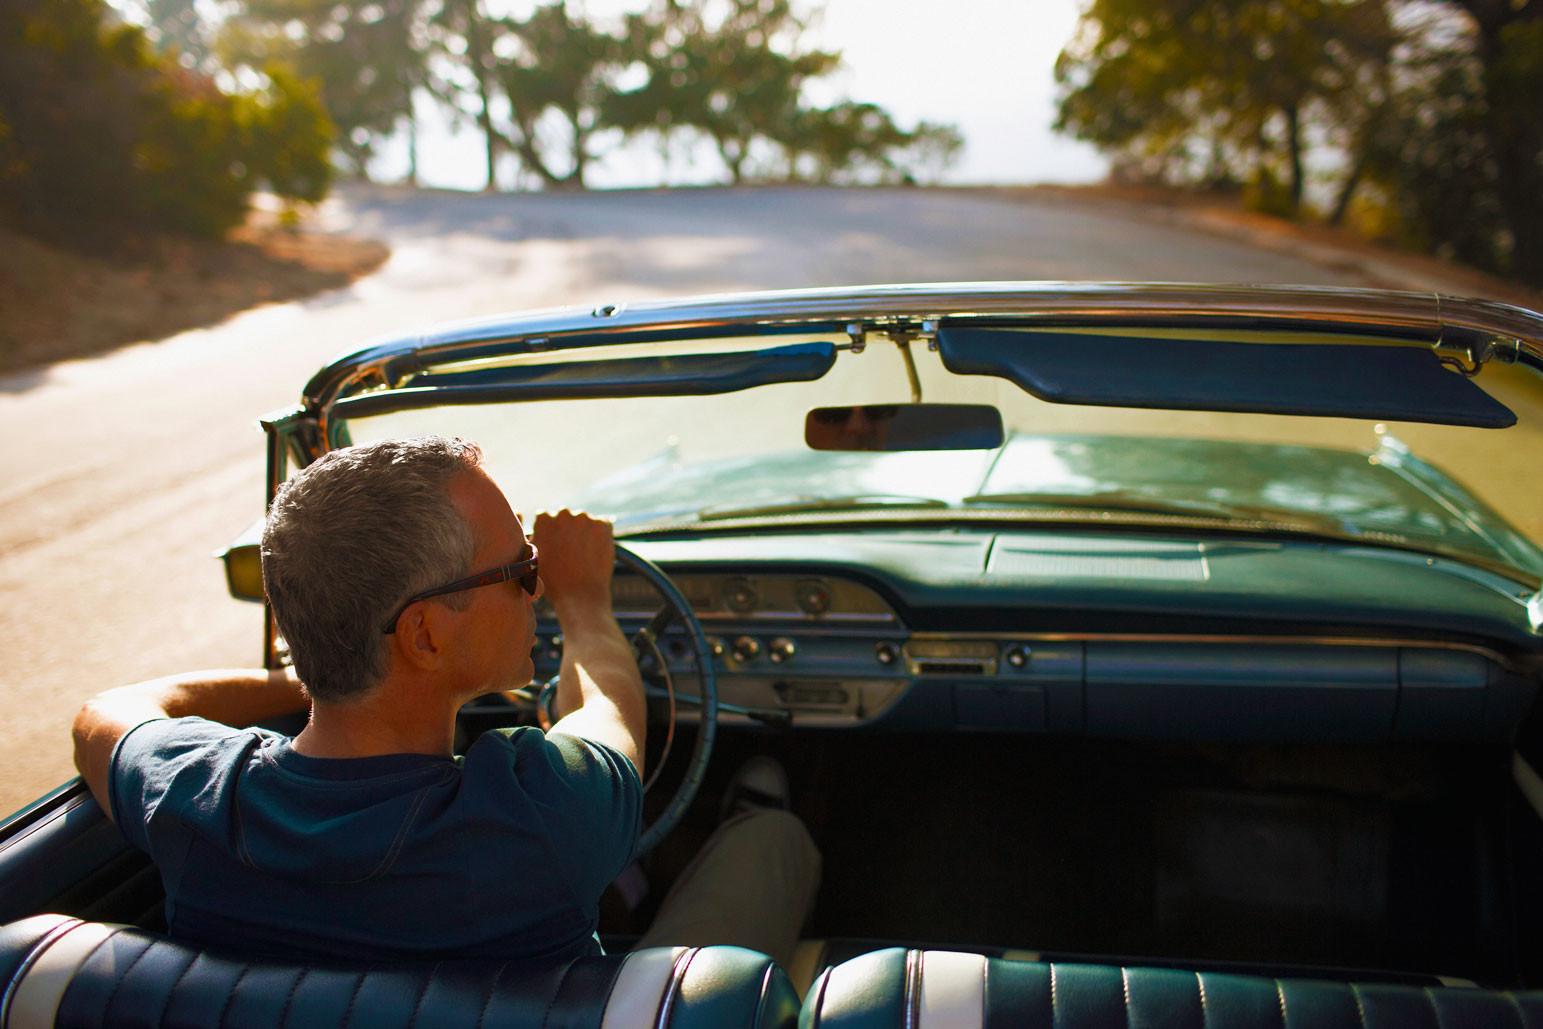 Man with grey hair driving convertible car down a sunny road